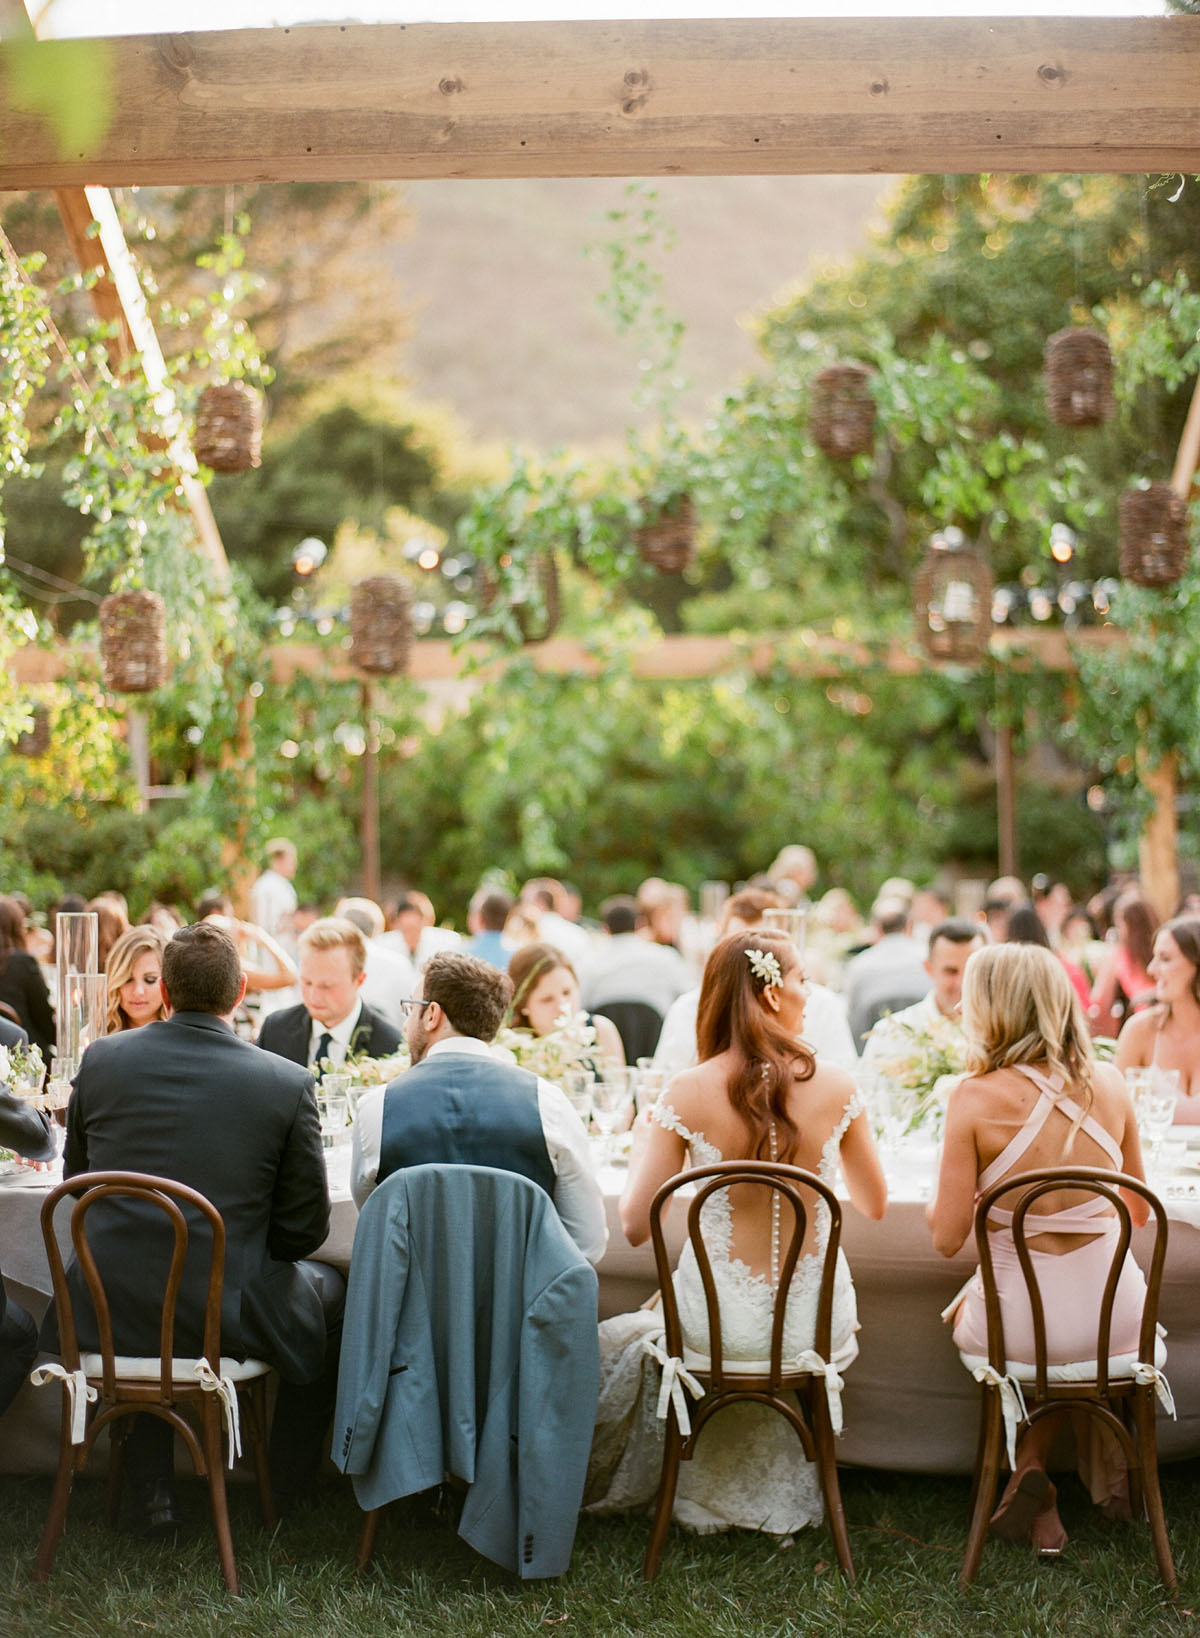 59-gardener-ranch-wedding-carmel.jpg